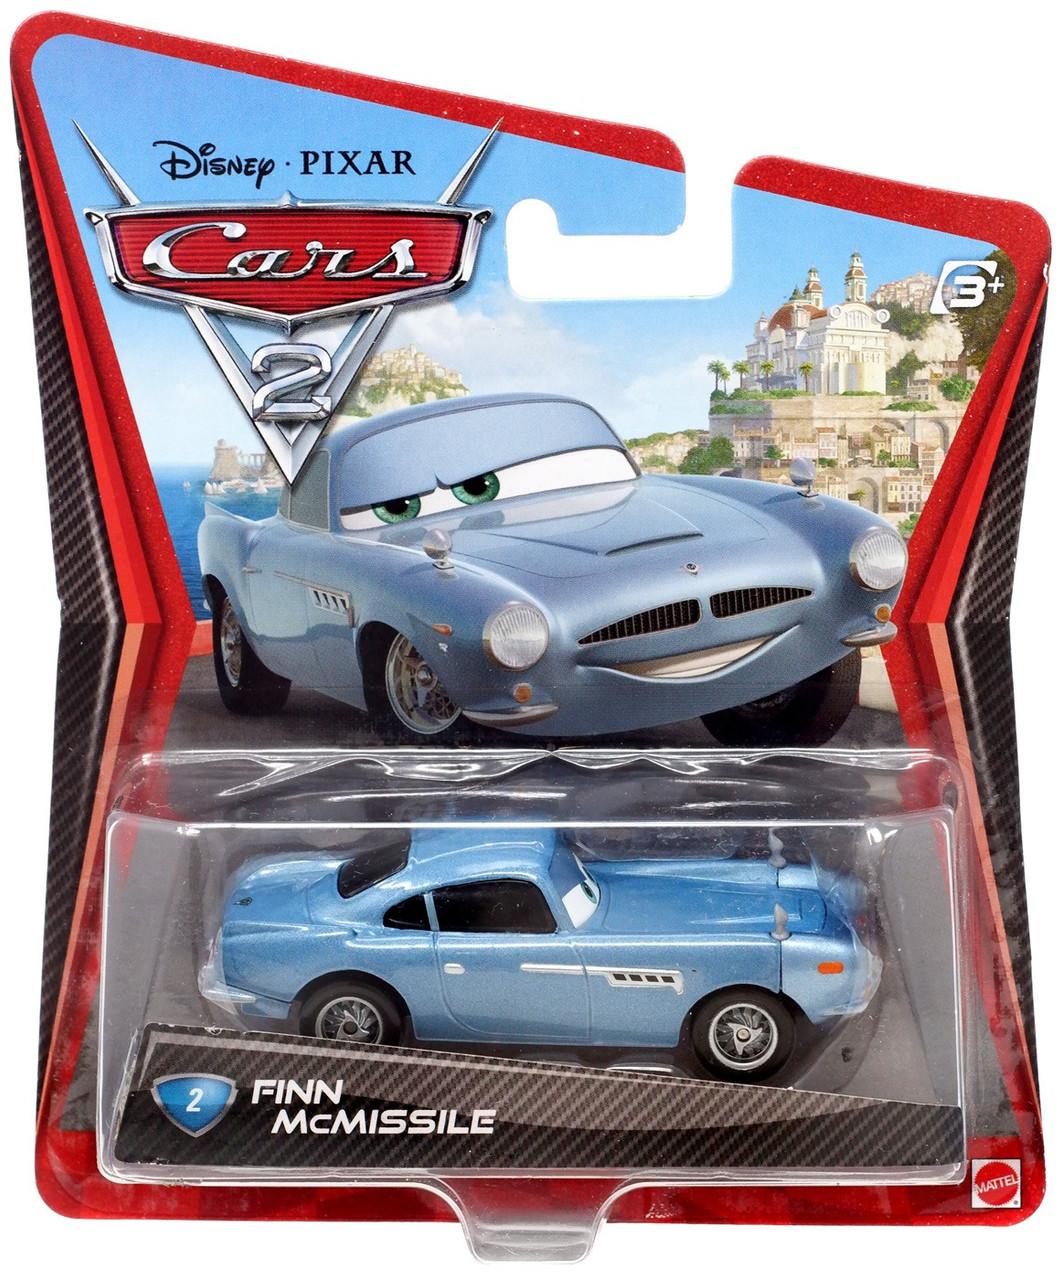 Finn Mcmissile Giocattolo Mattel Disney 1 55 Cars Auto: Disney Pixar Cars Cars 2 Main Series Finn McMissile 155